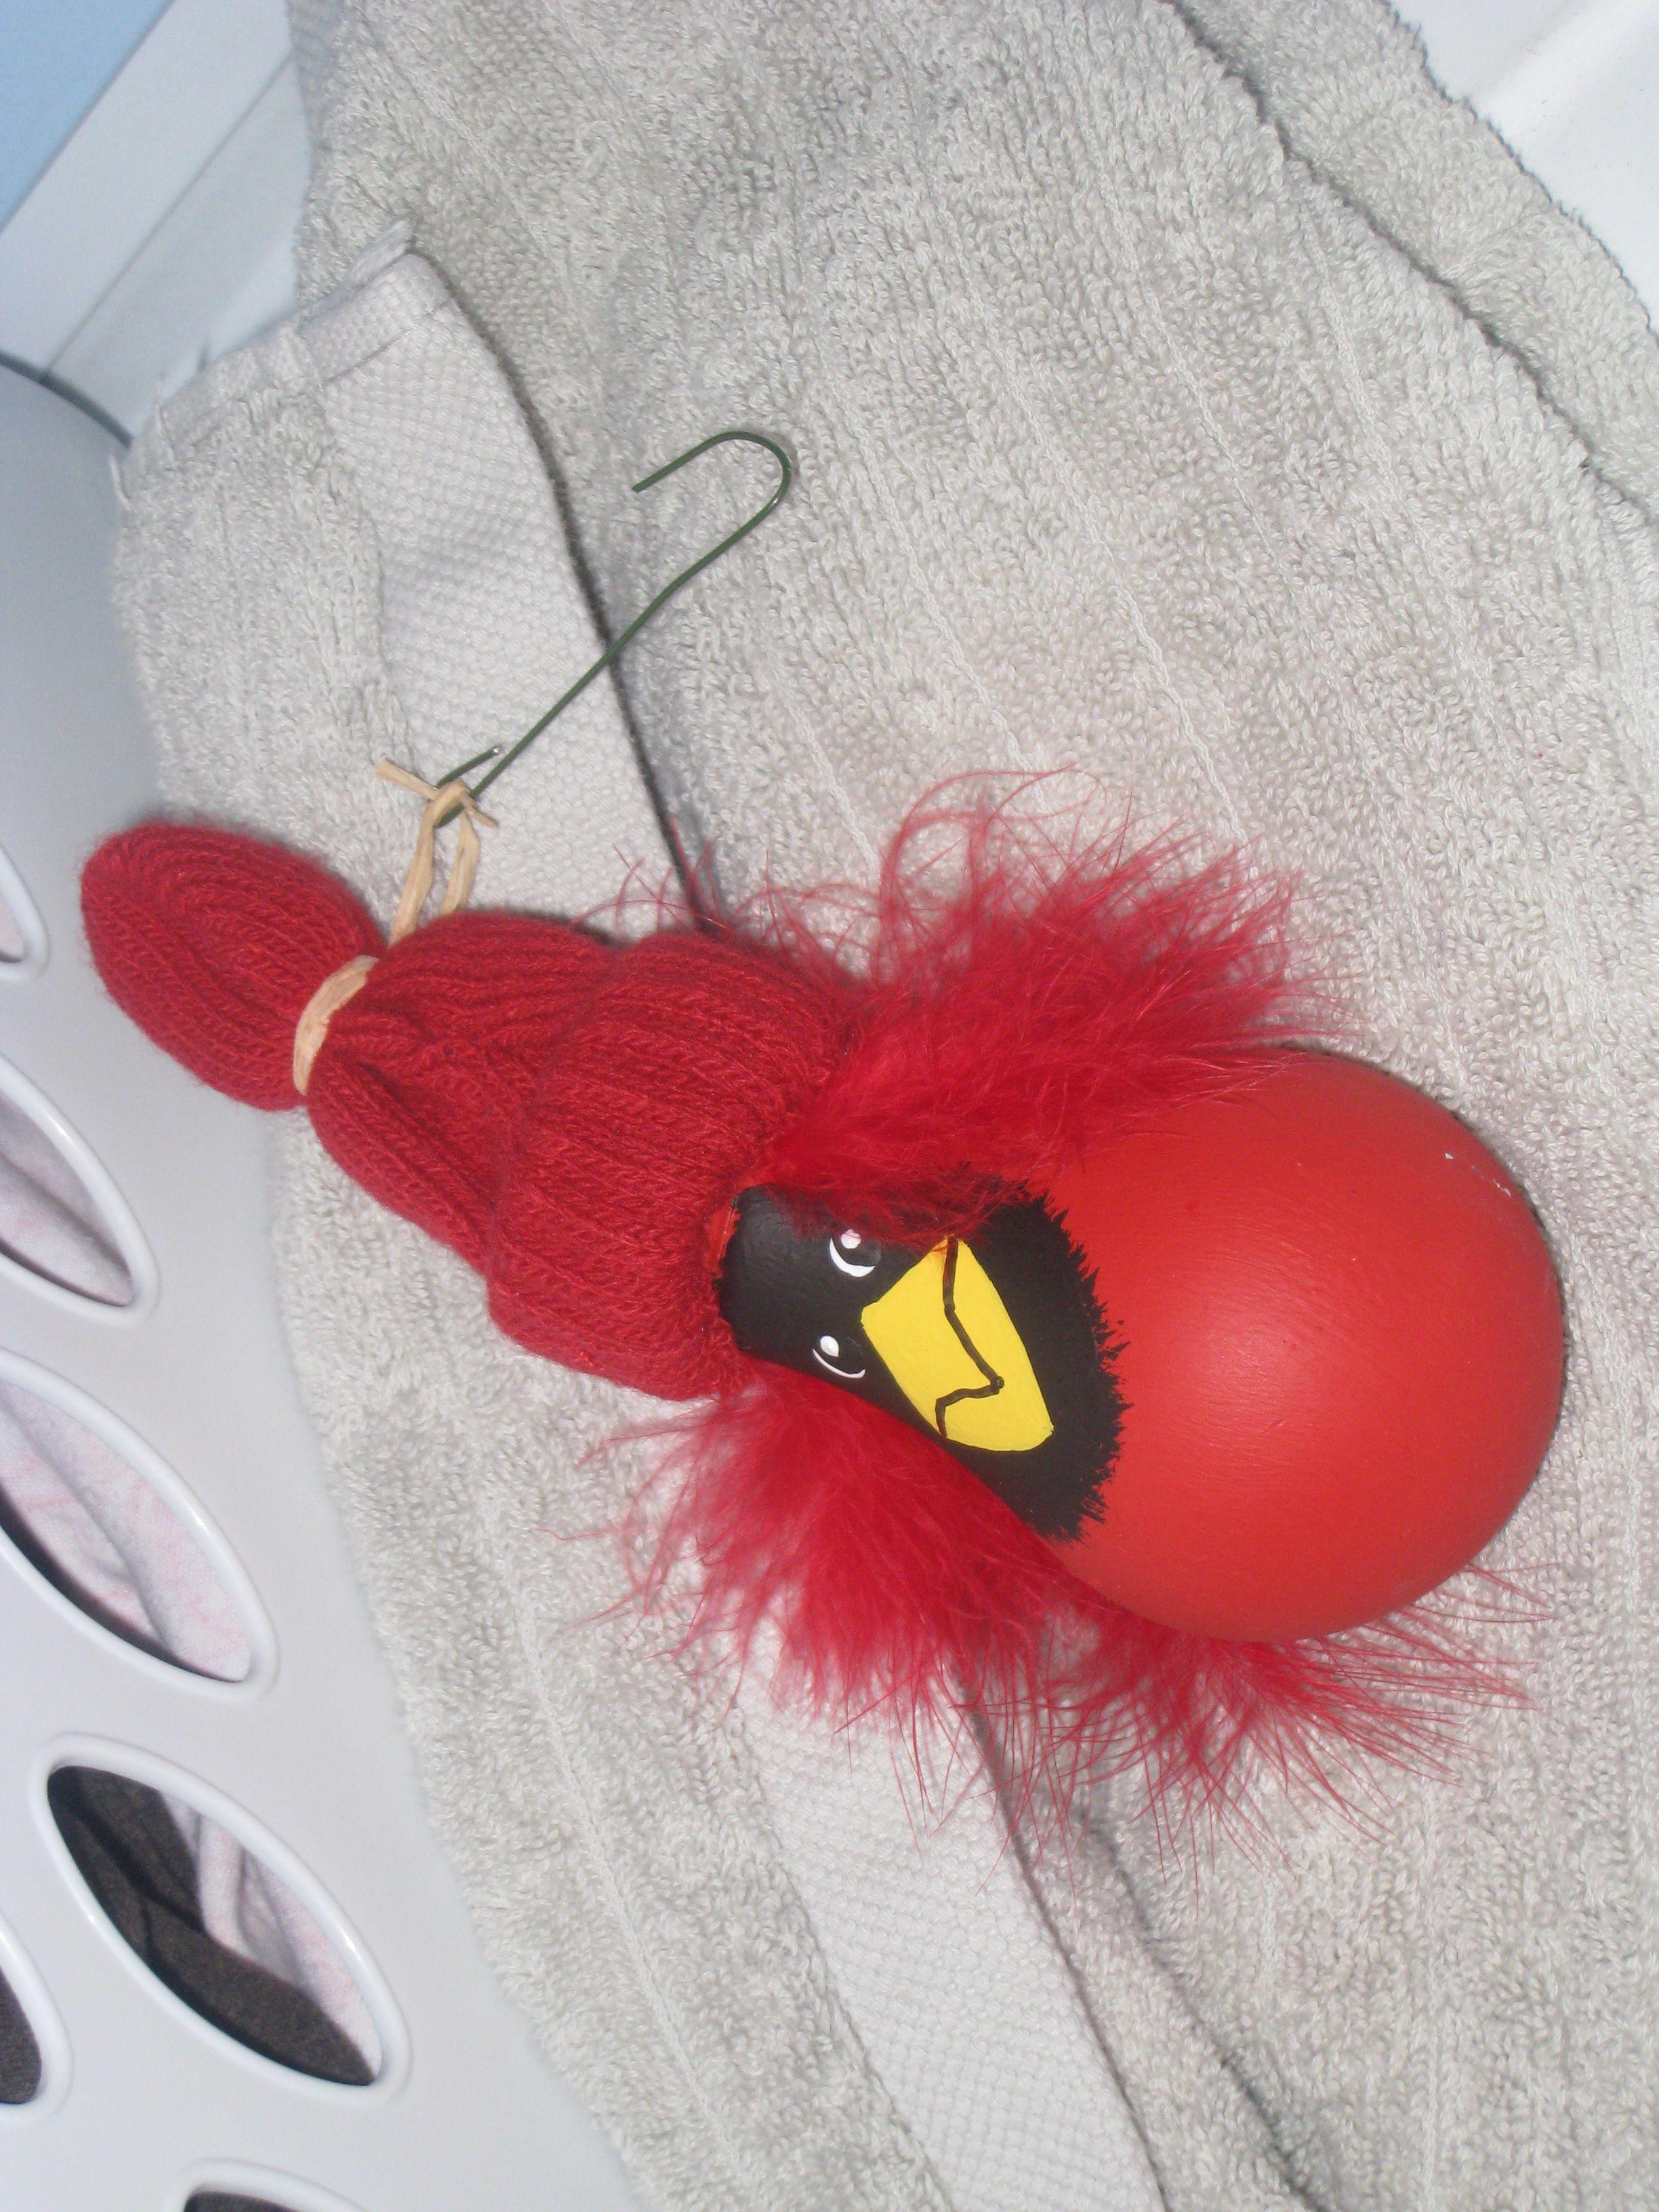 Cardinal light bulb ornament | Crafts - Christmas light bulbs ... for Painted Light Bulb Art  555kxo